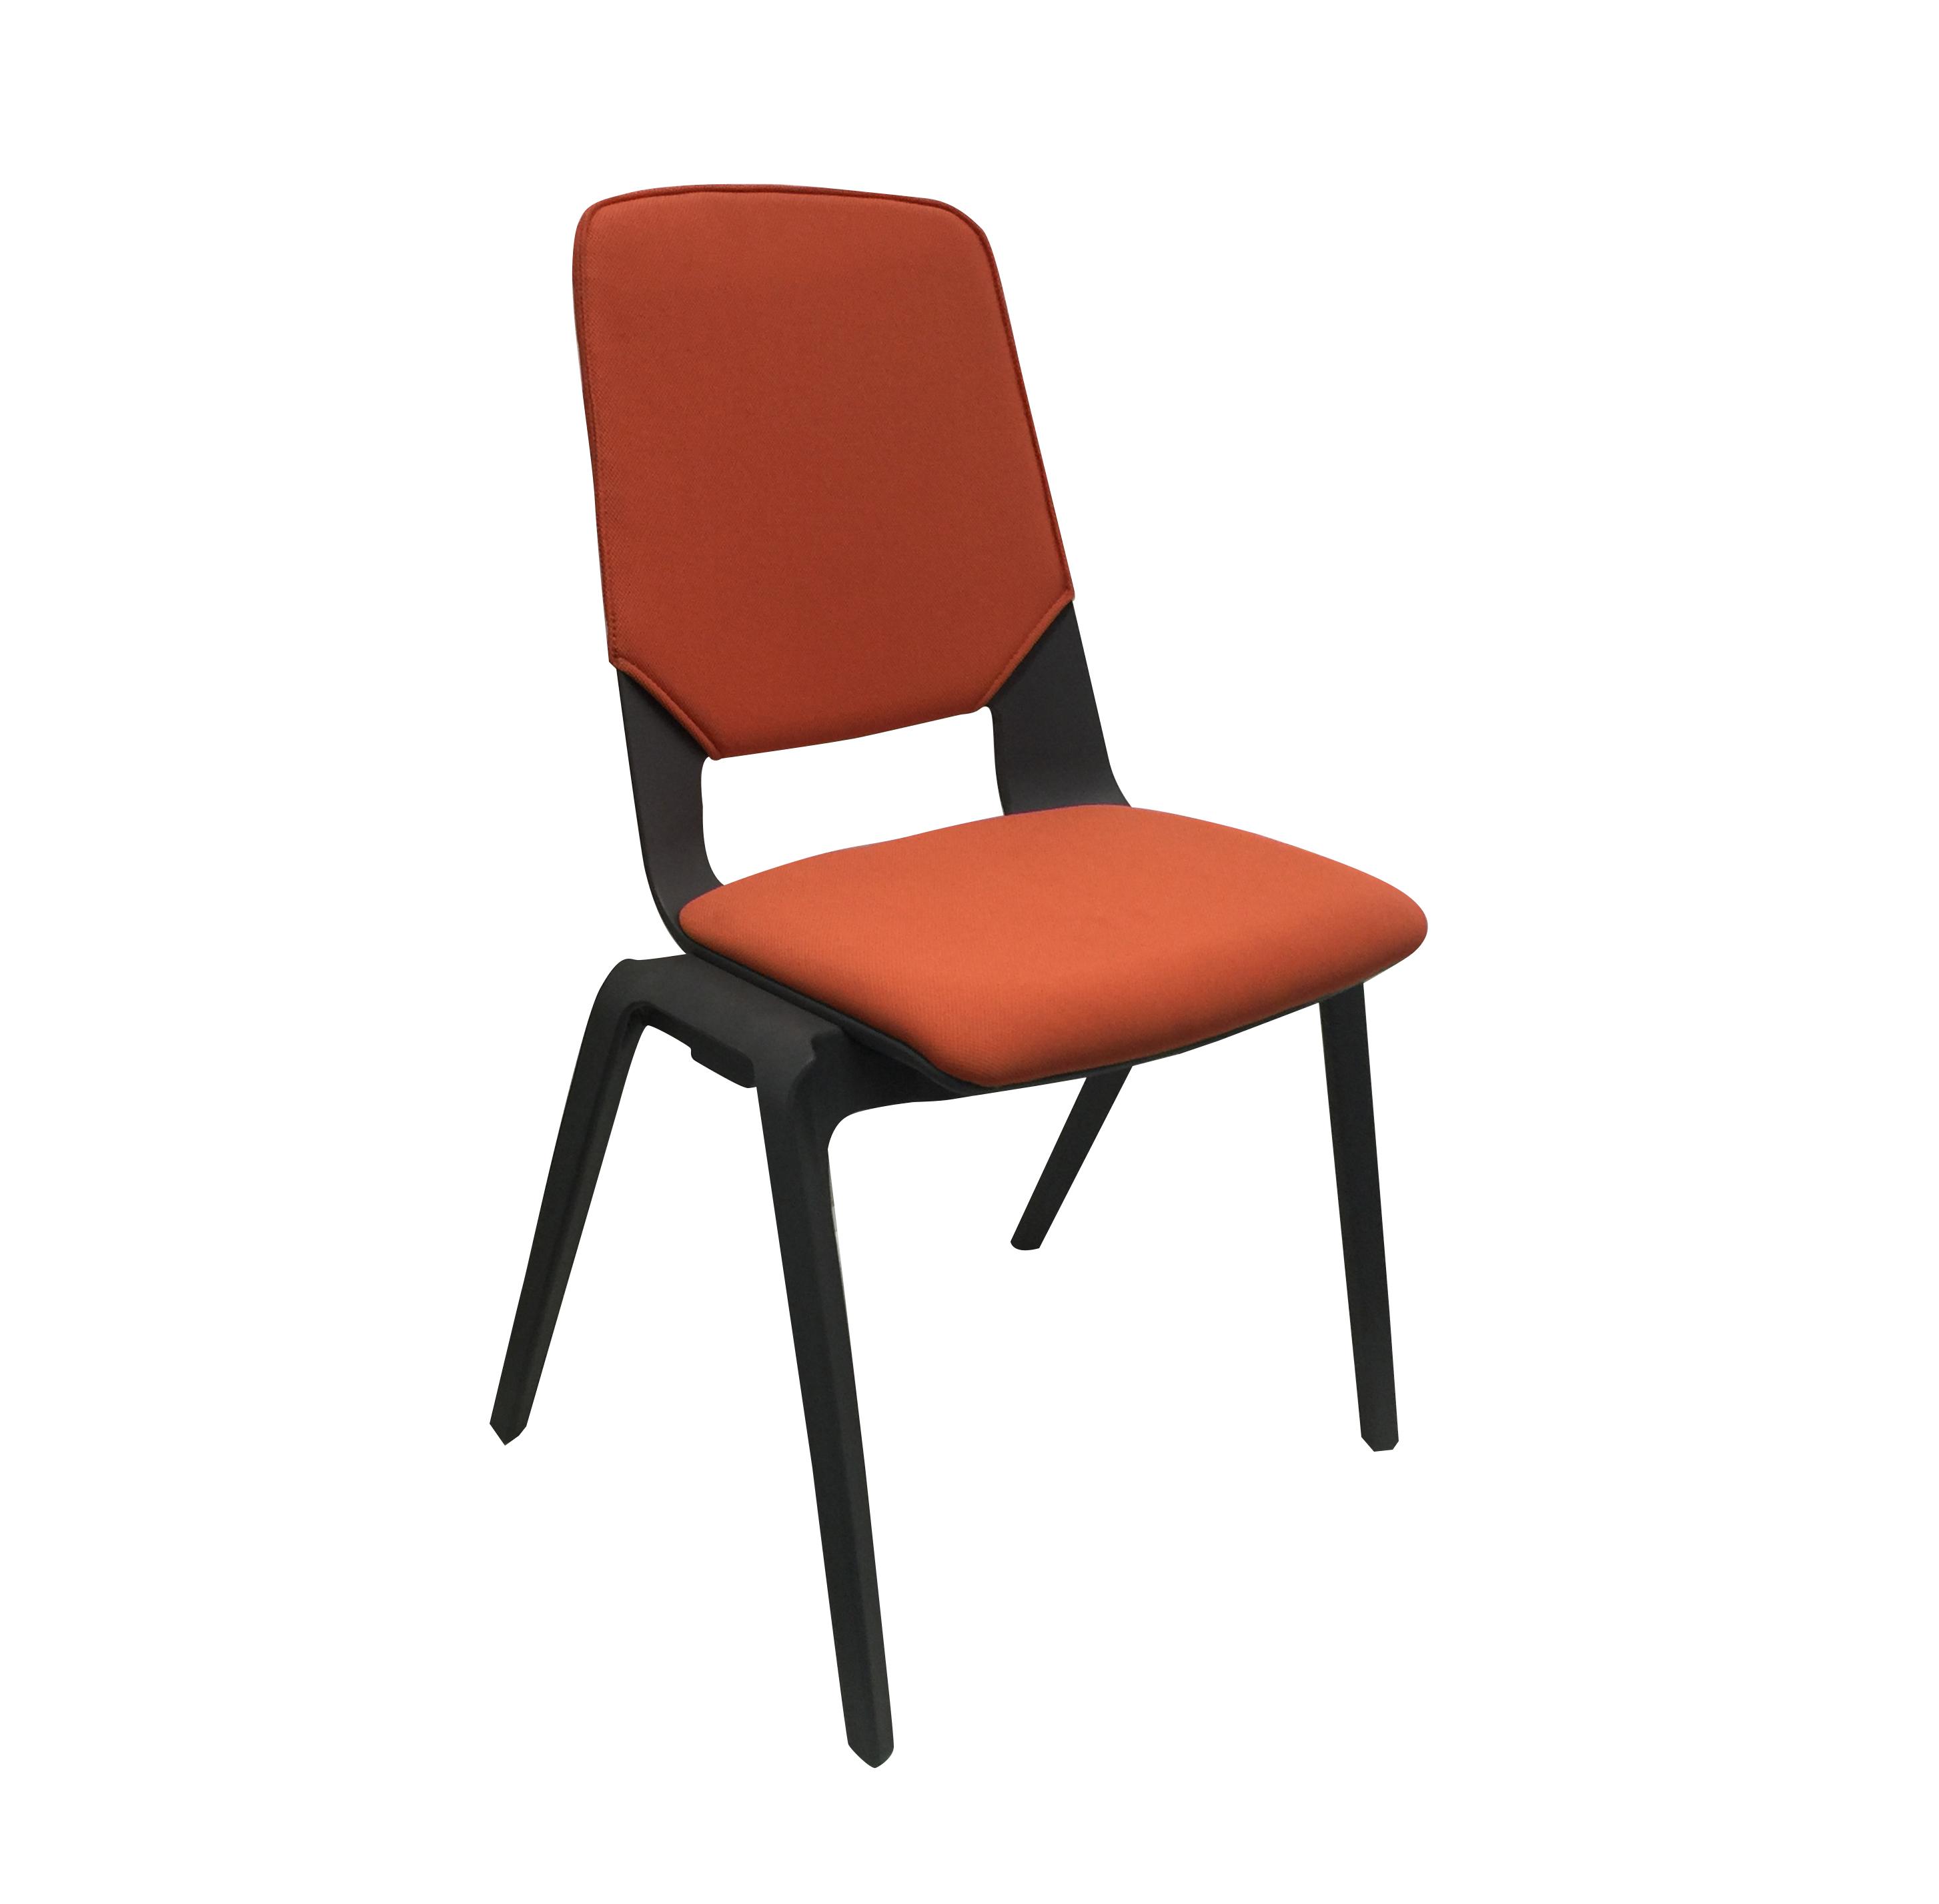 Fila Linkable Chairs